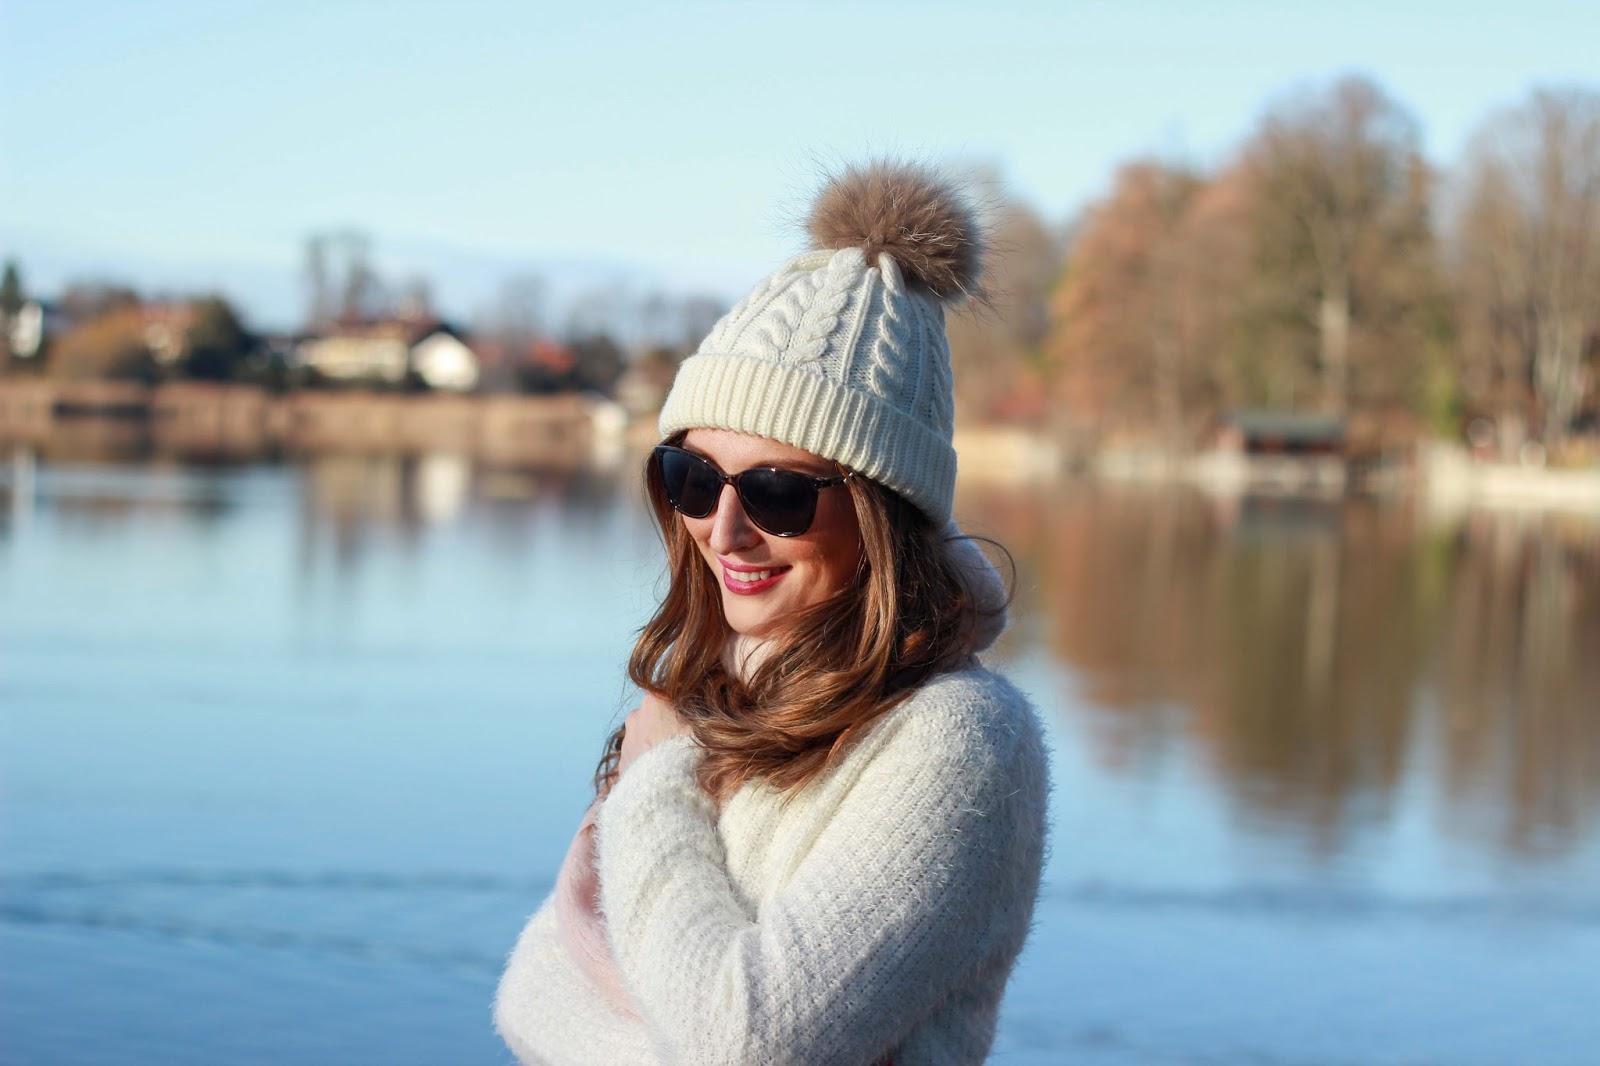 Cardigan - Fashionblogger - Fashionstylebyjohanna - Münchner Blogger - Münchner Fashionblogger - München - Blogger aus München